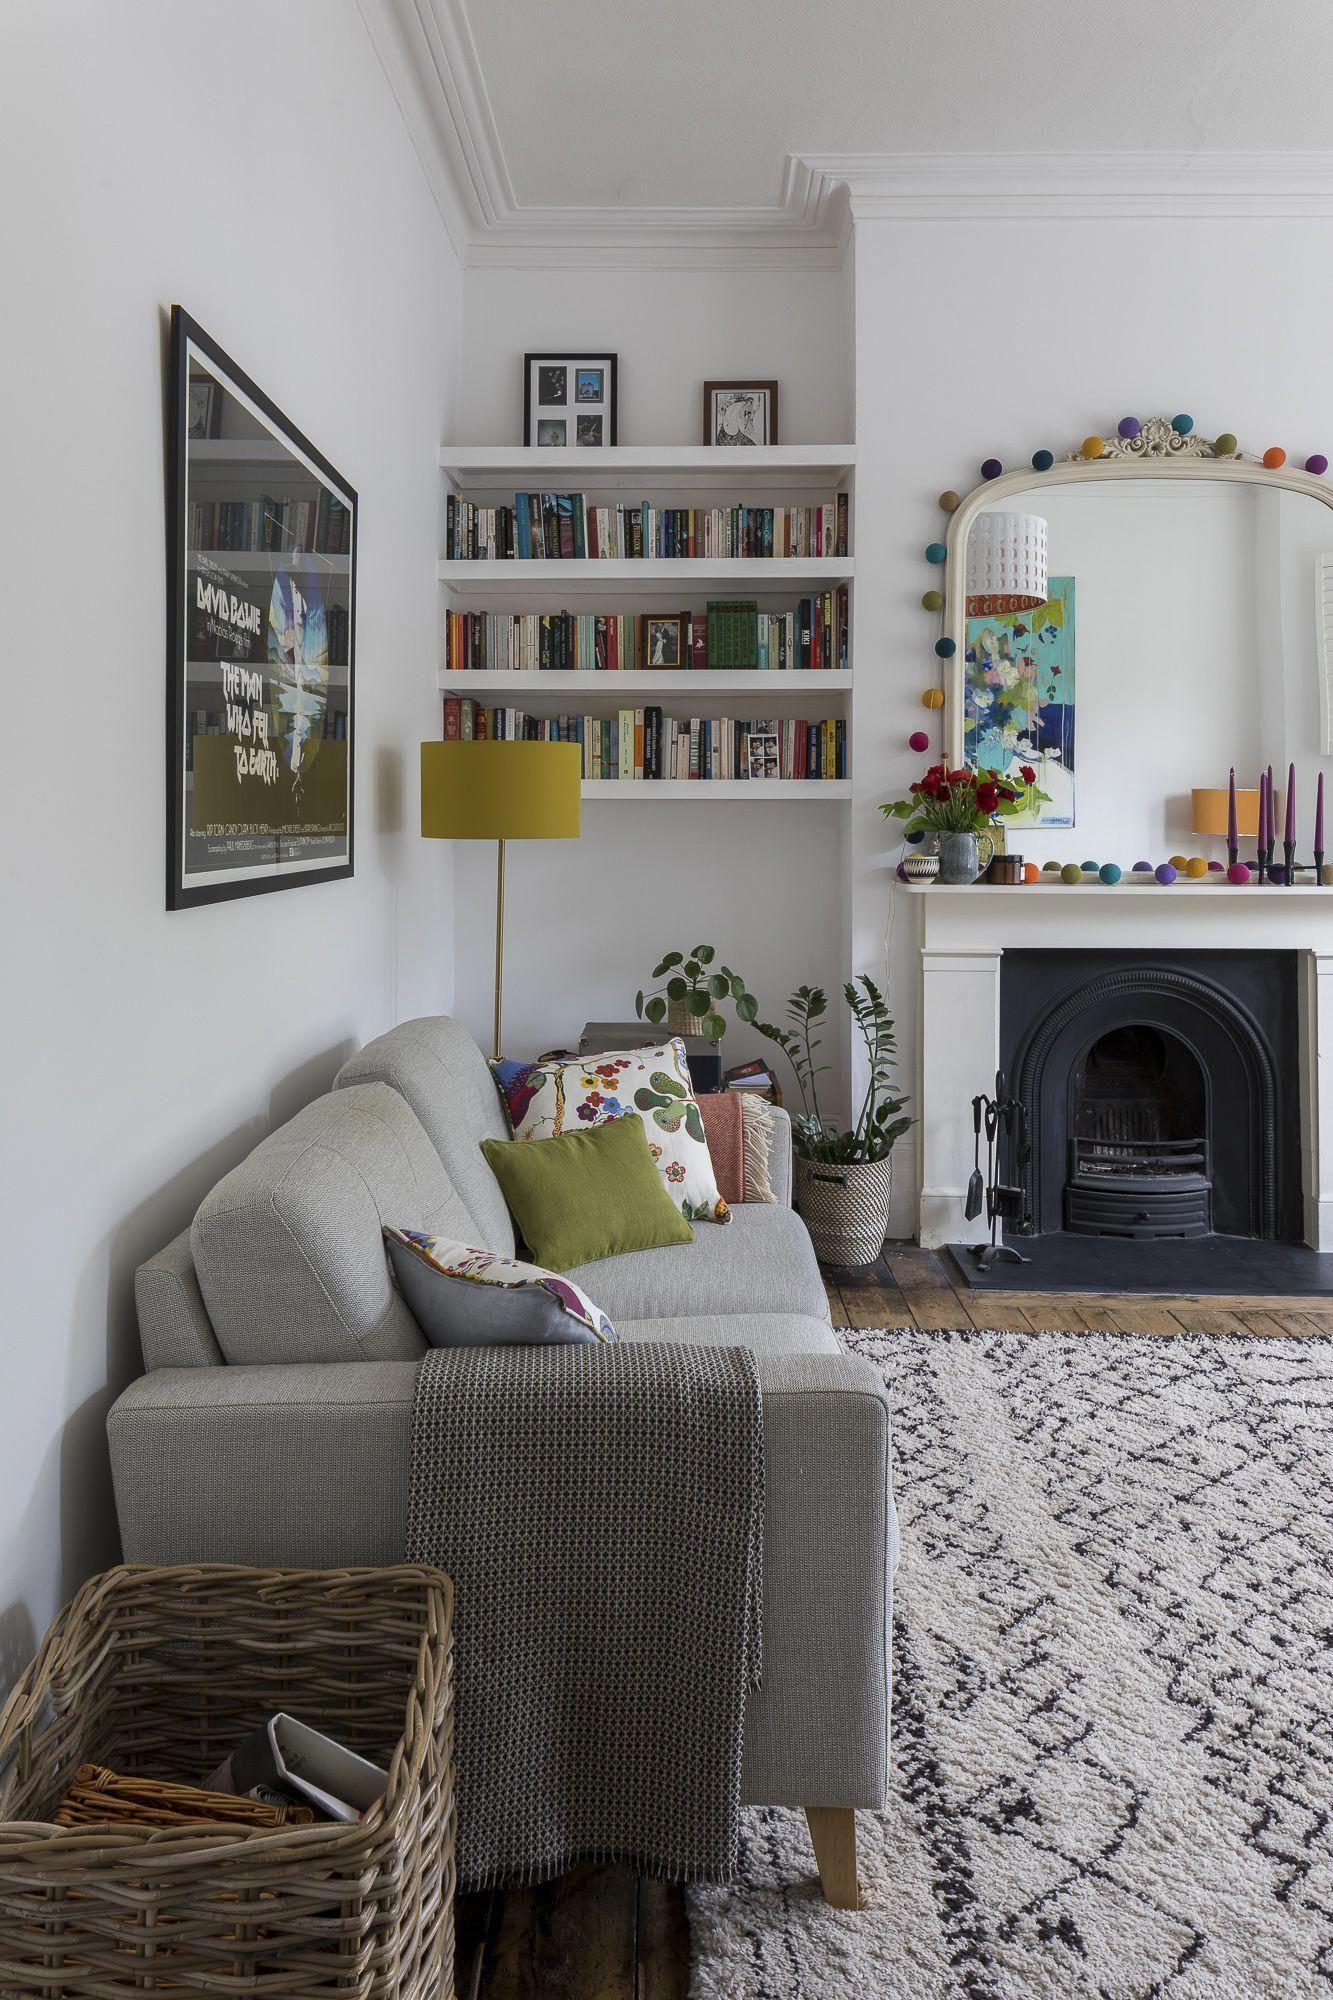 Home decor tips and techniques for contemporary interior design living room contemporaryinteriordesignlivingroom also rh pinterest